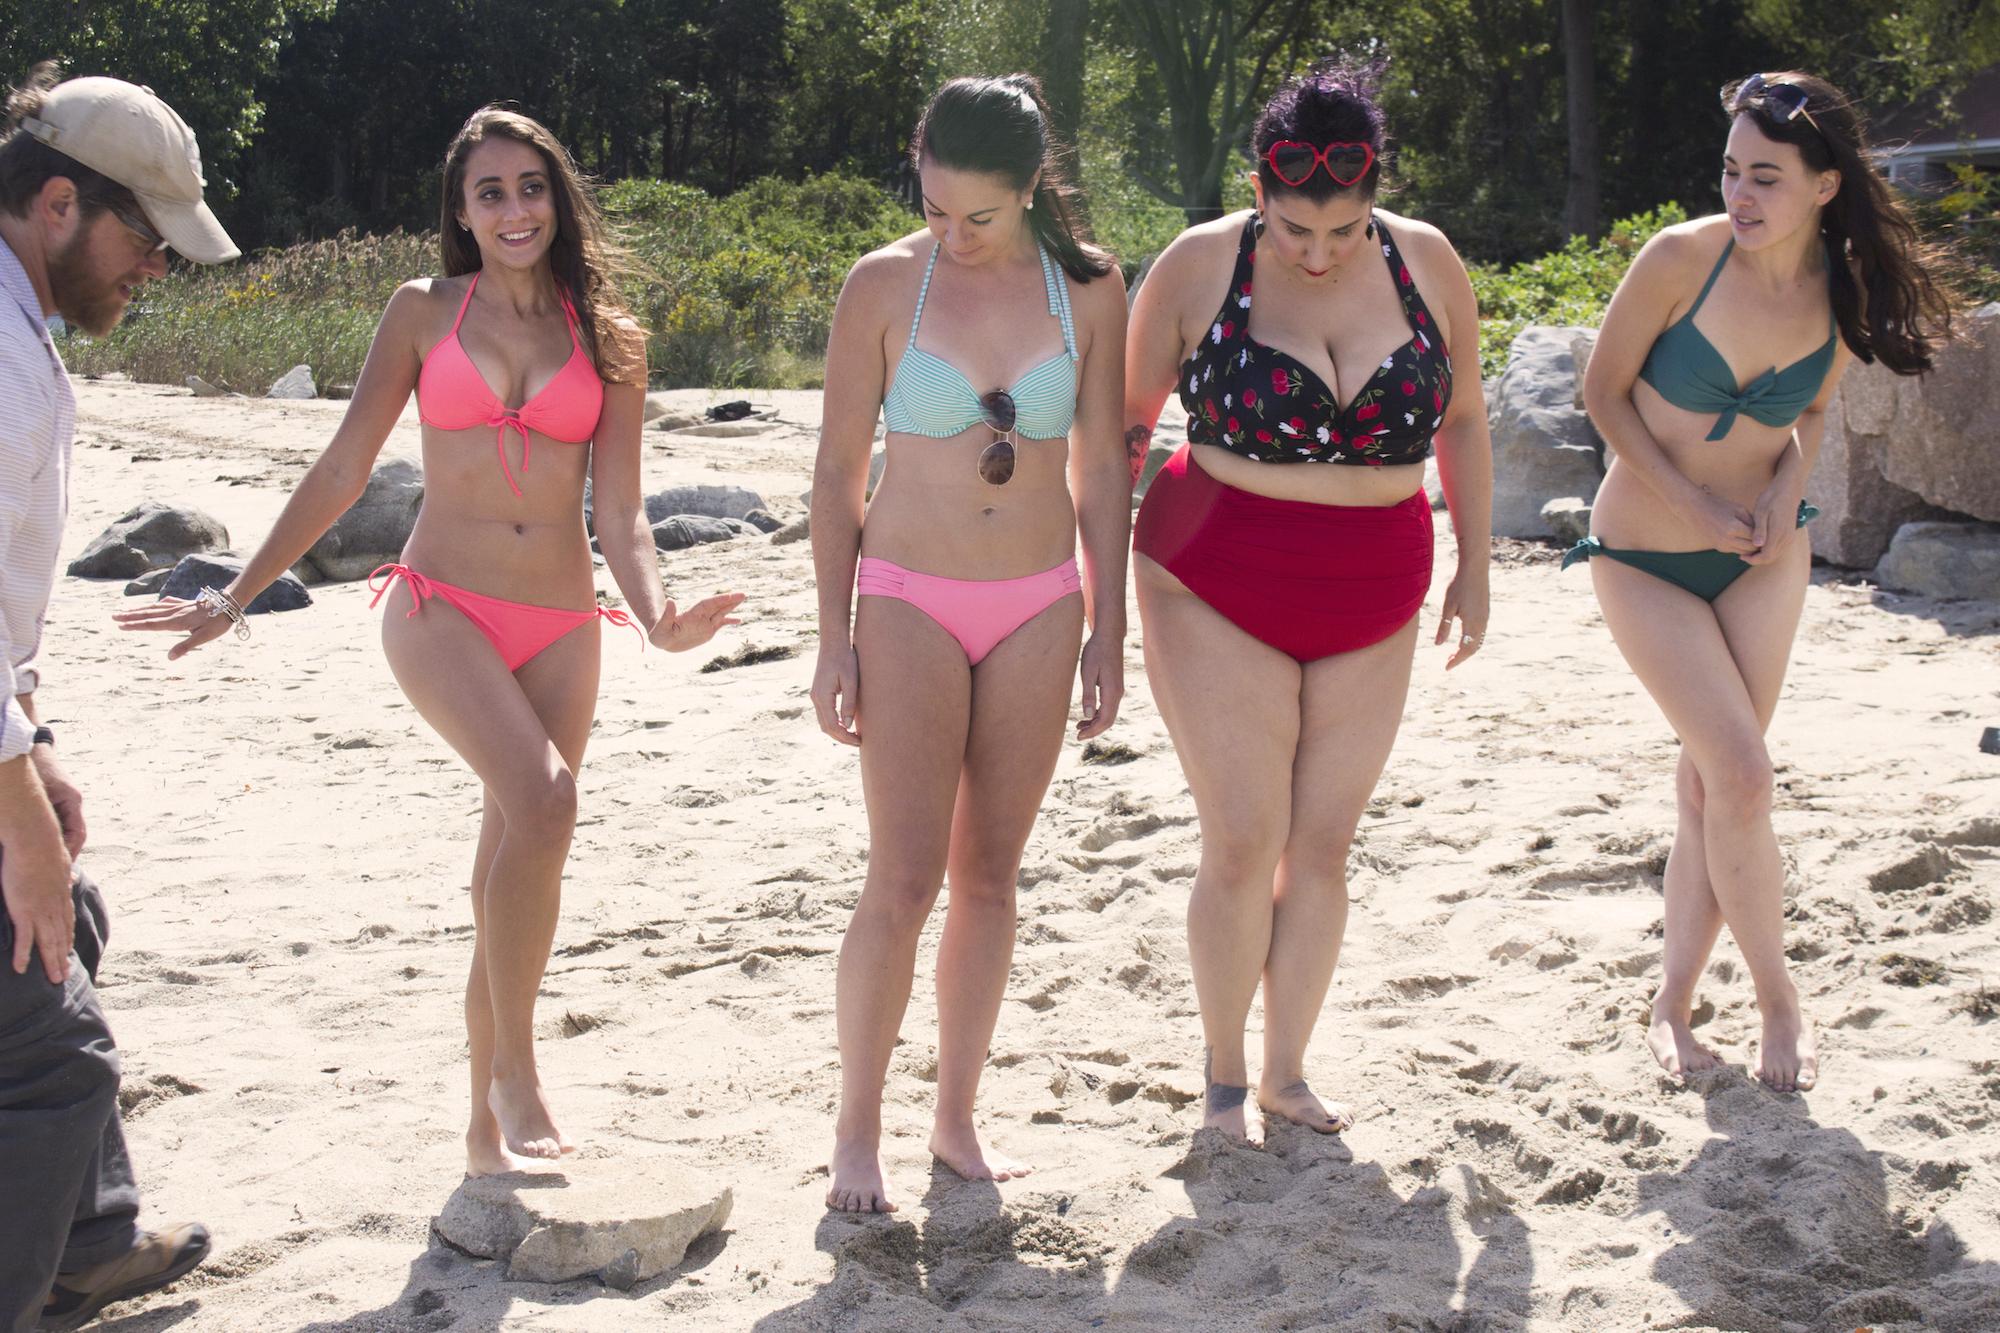 Grip/Gaffer Dan Perez de la Garza with Actors Acei Martin, Catalina Snape, Alessandra Grima and Maya Simone on the set of Geena Matuson's production of 'Fauxmercials' beach ads, September 2016.